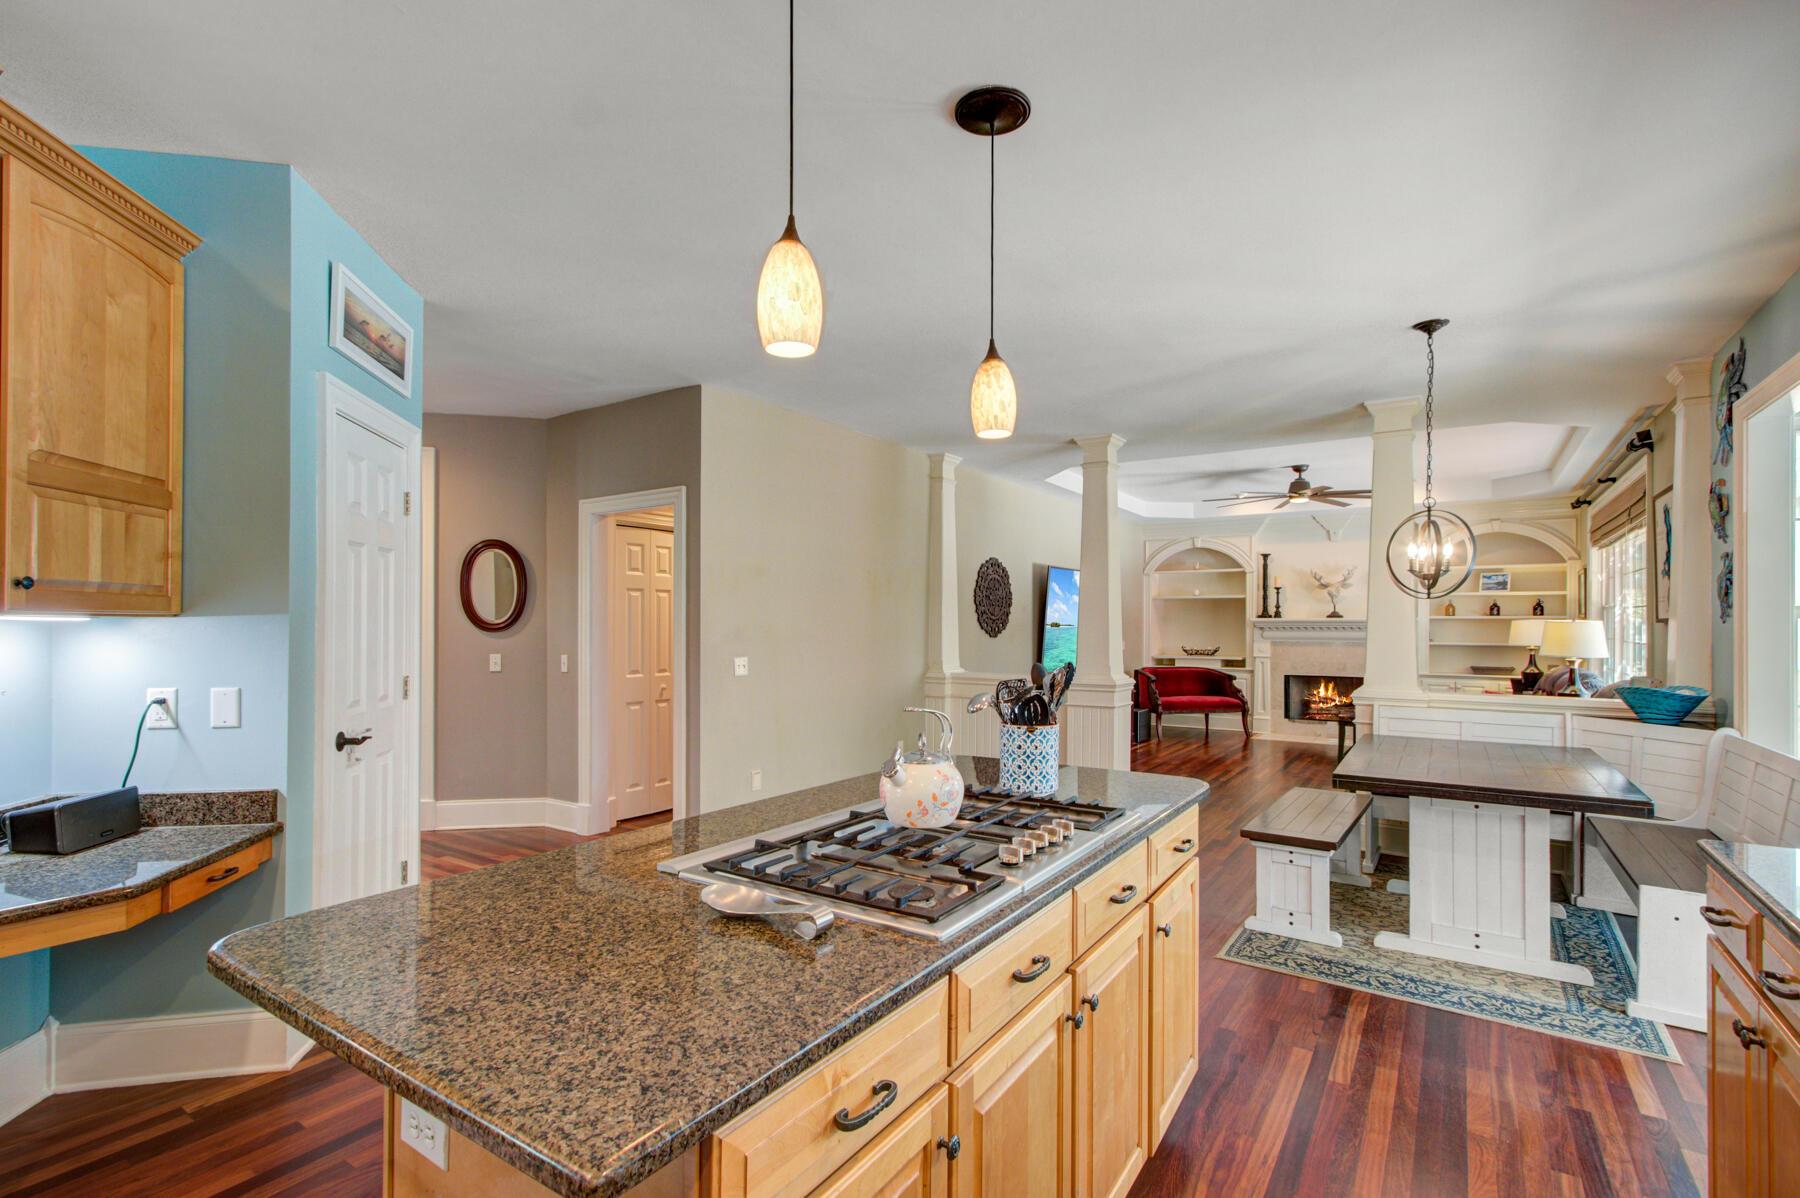 Dunes West Homes For Sale - 3095 Pignatelli, Mount Pleasant, SC - 10